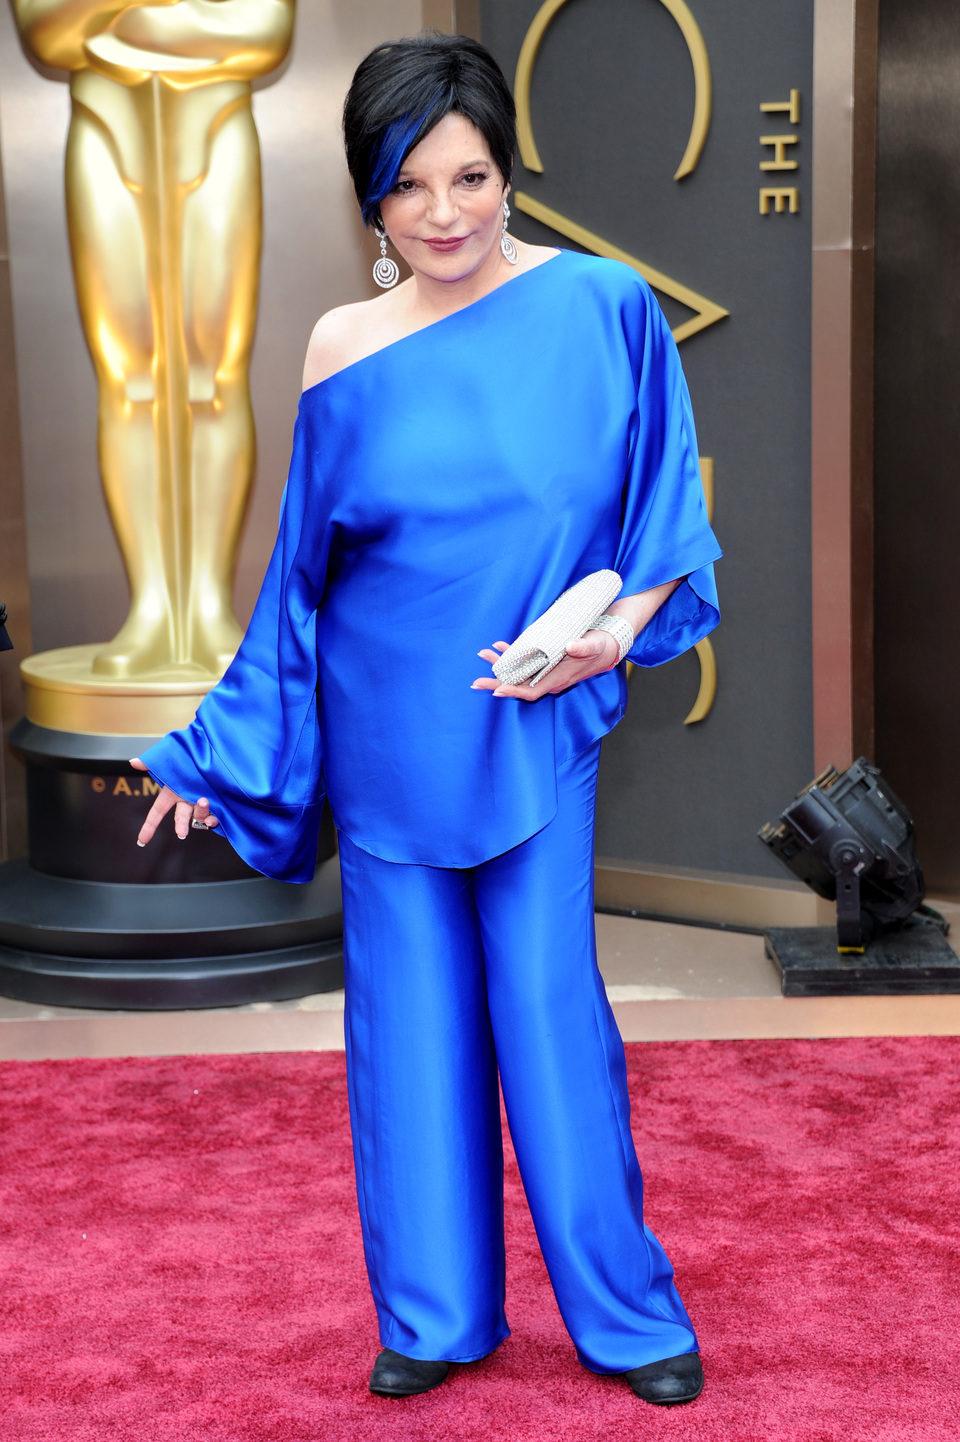 Liza Minelli at the 2014 Oscars